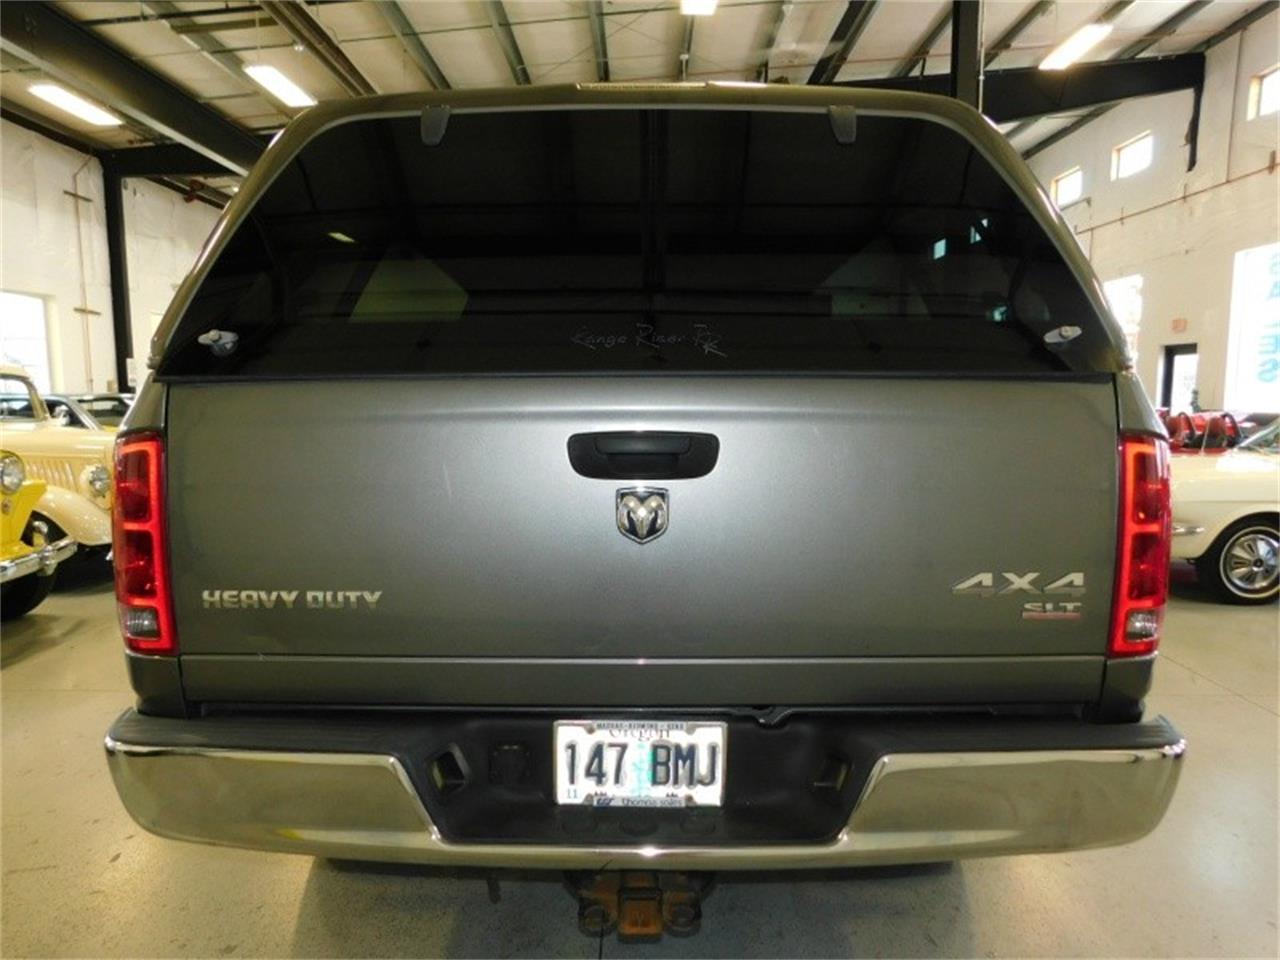 2005 Dodge Ram 2500 (CC-1246641) for sale in Bend, Oregon